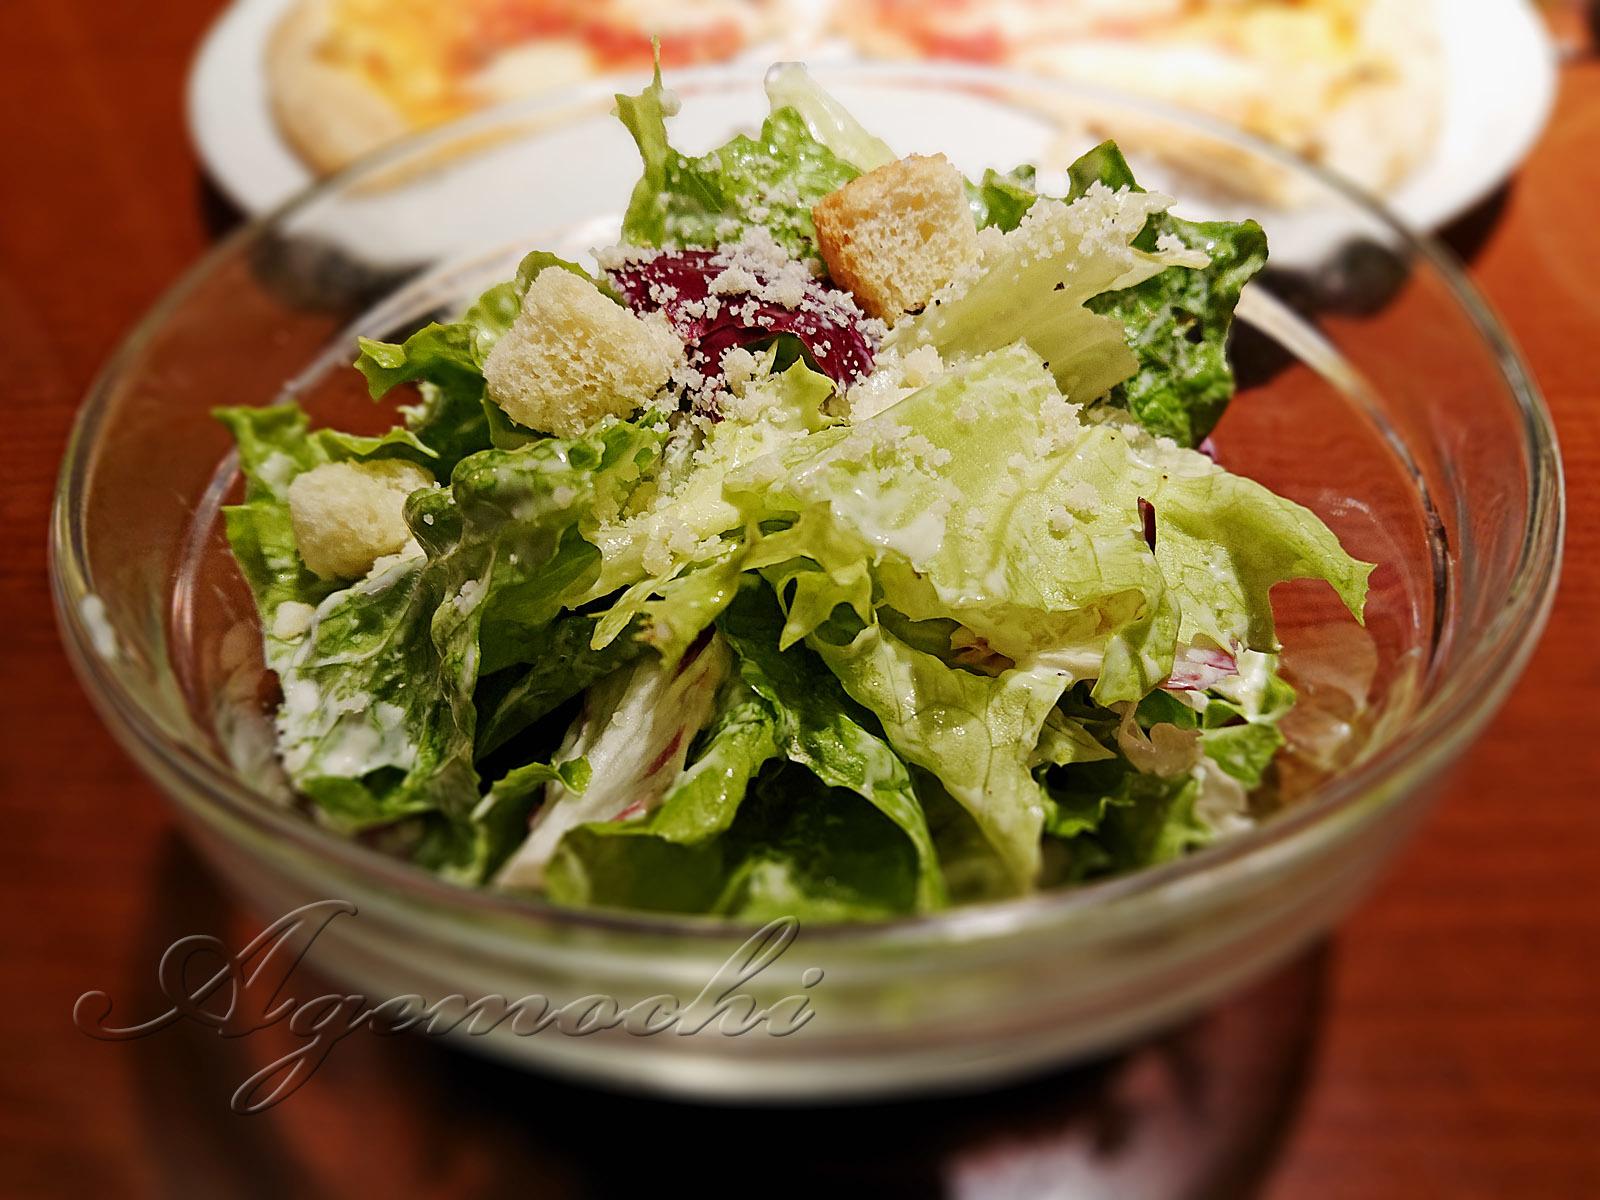 capri_salad.jpg